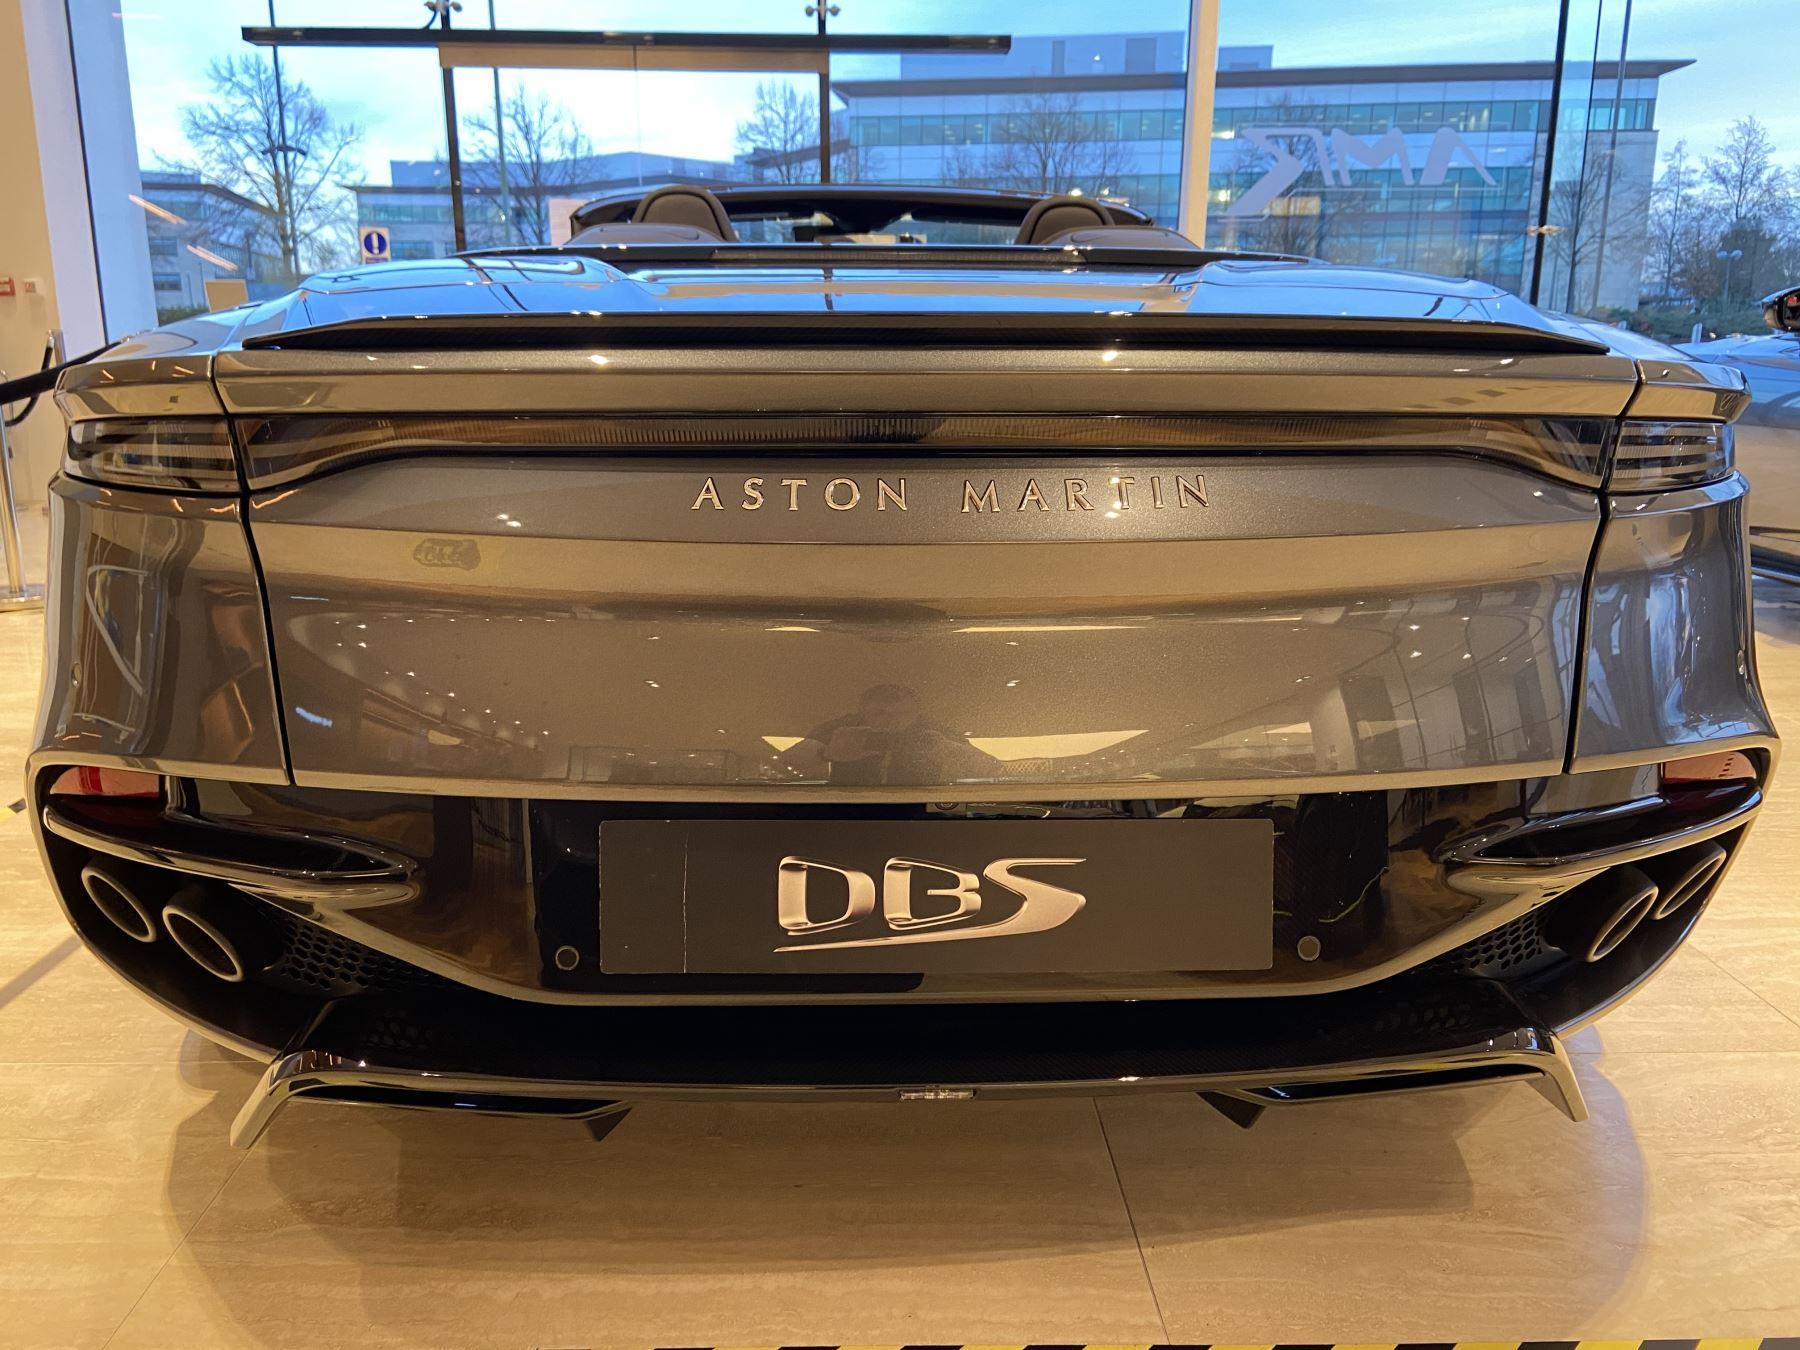 Aston Martin DBS V12 Superleggera Volante Touchtronic image 9